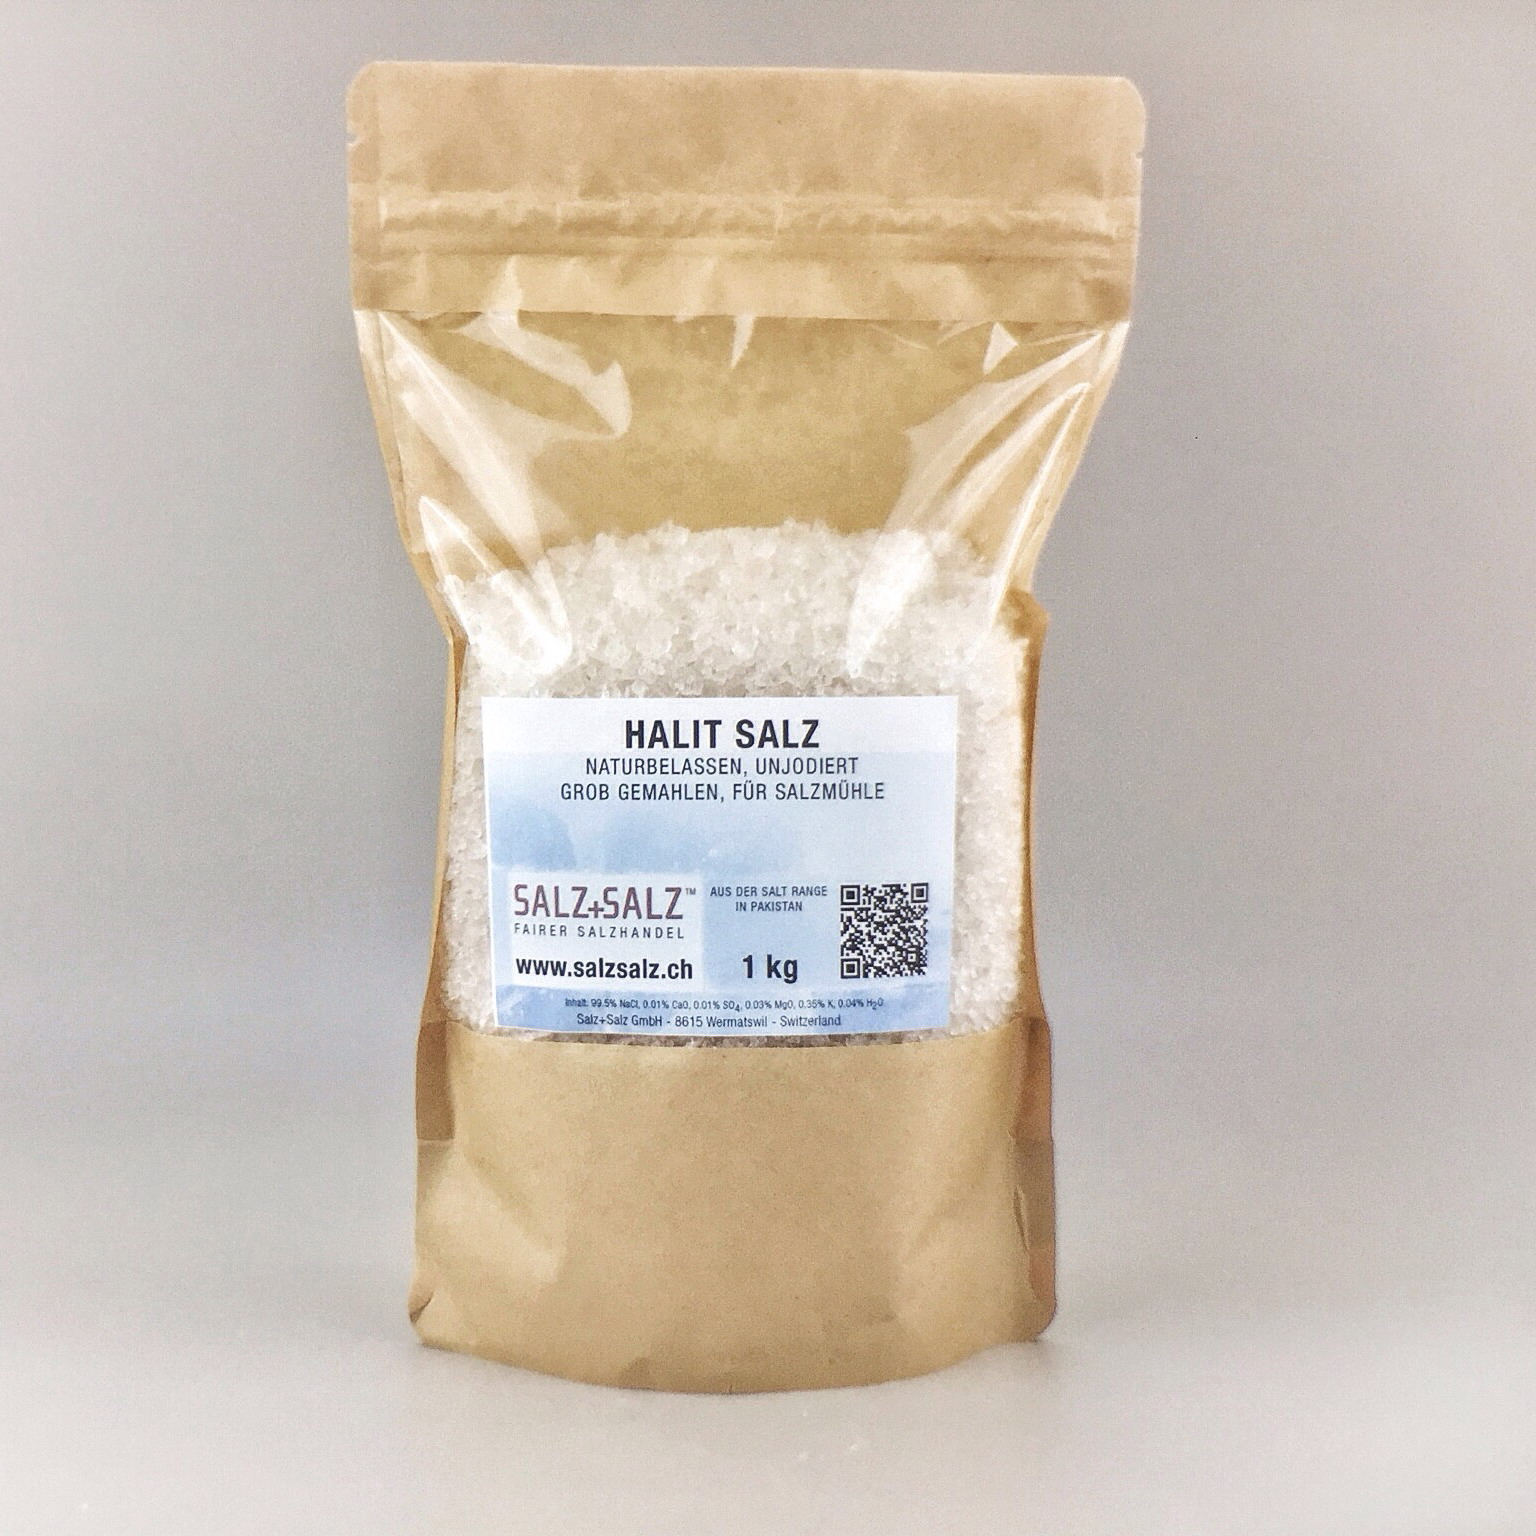 Halit Salz grob gemahlen im Papierbeutel 1k g